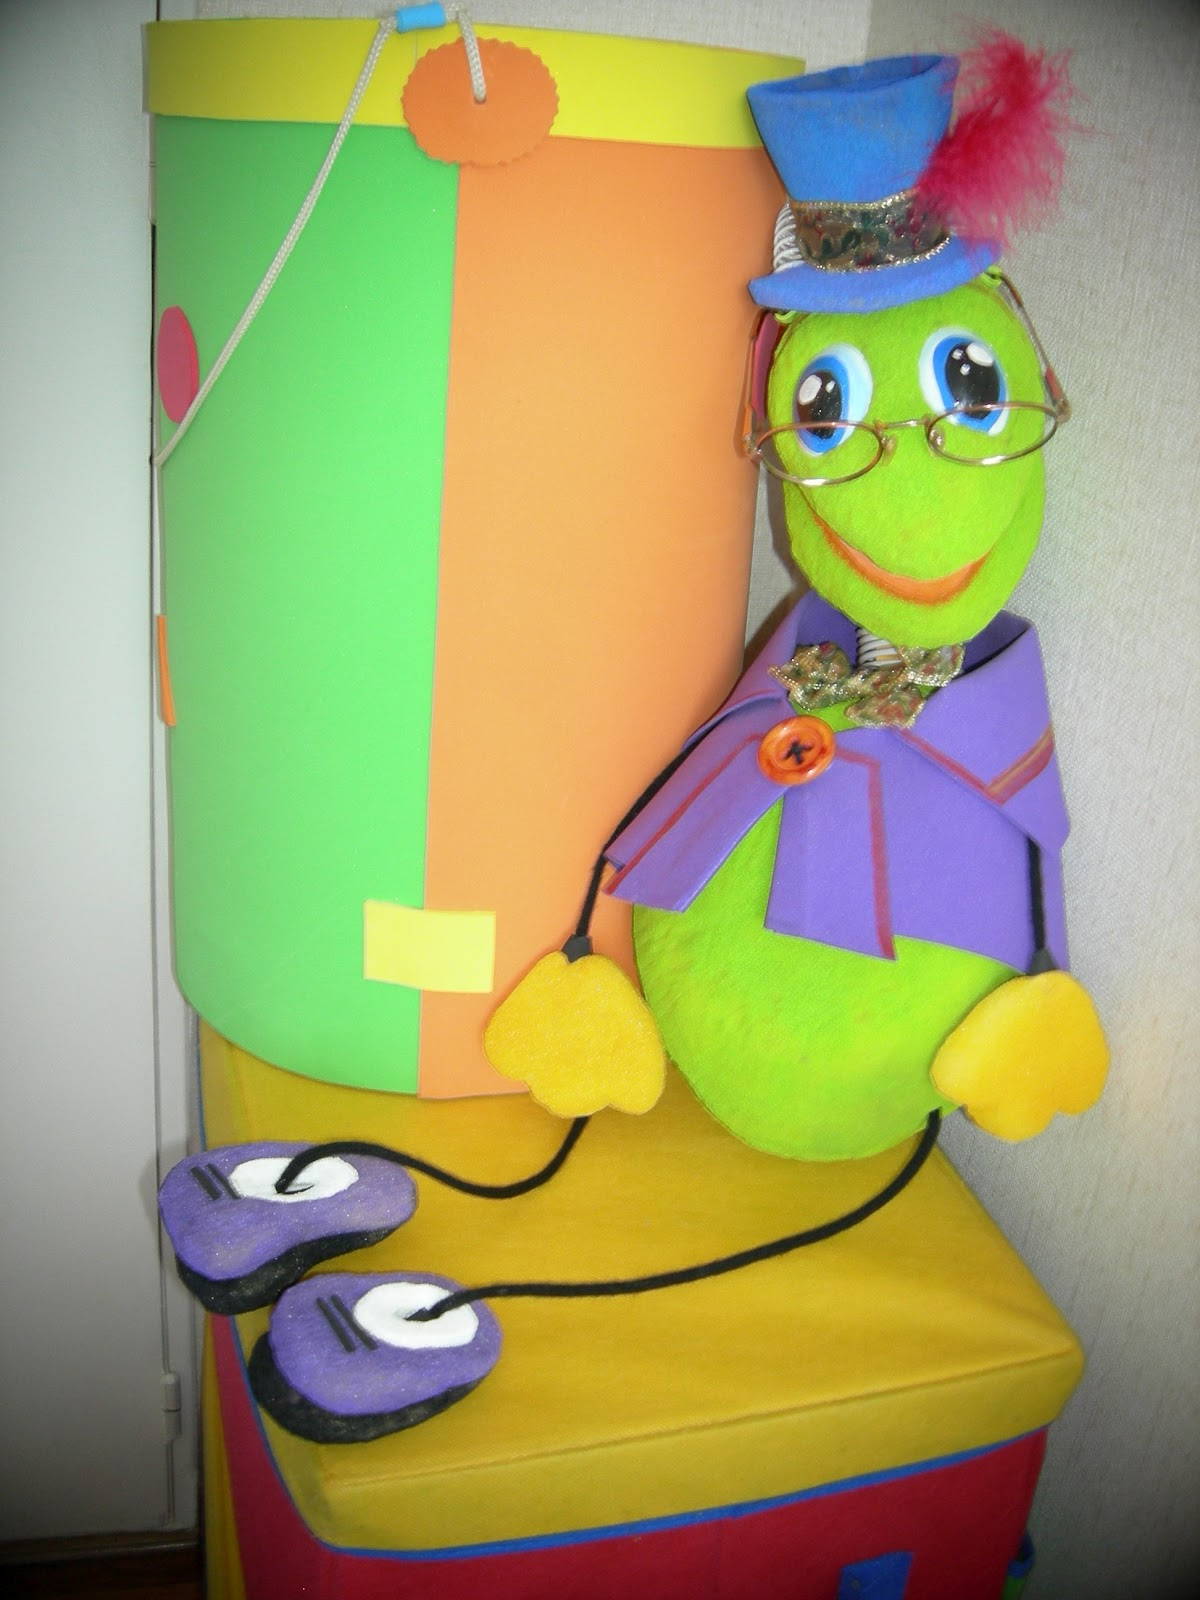 Arte gabrielle tallado de goma espuma marioneta de mano - Goma espuma manualidades ...